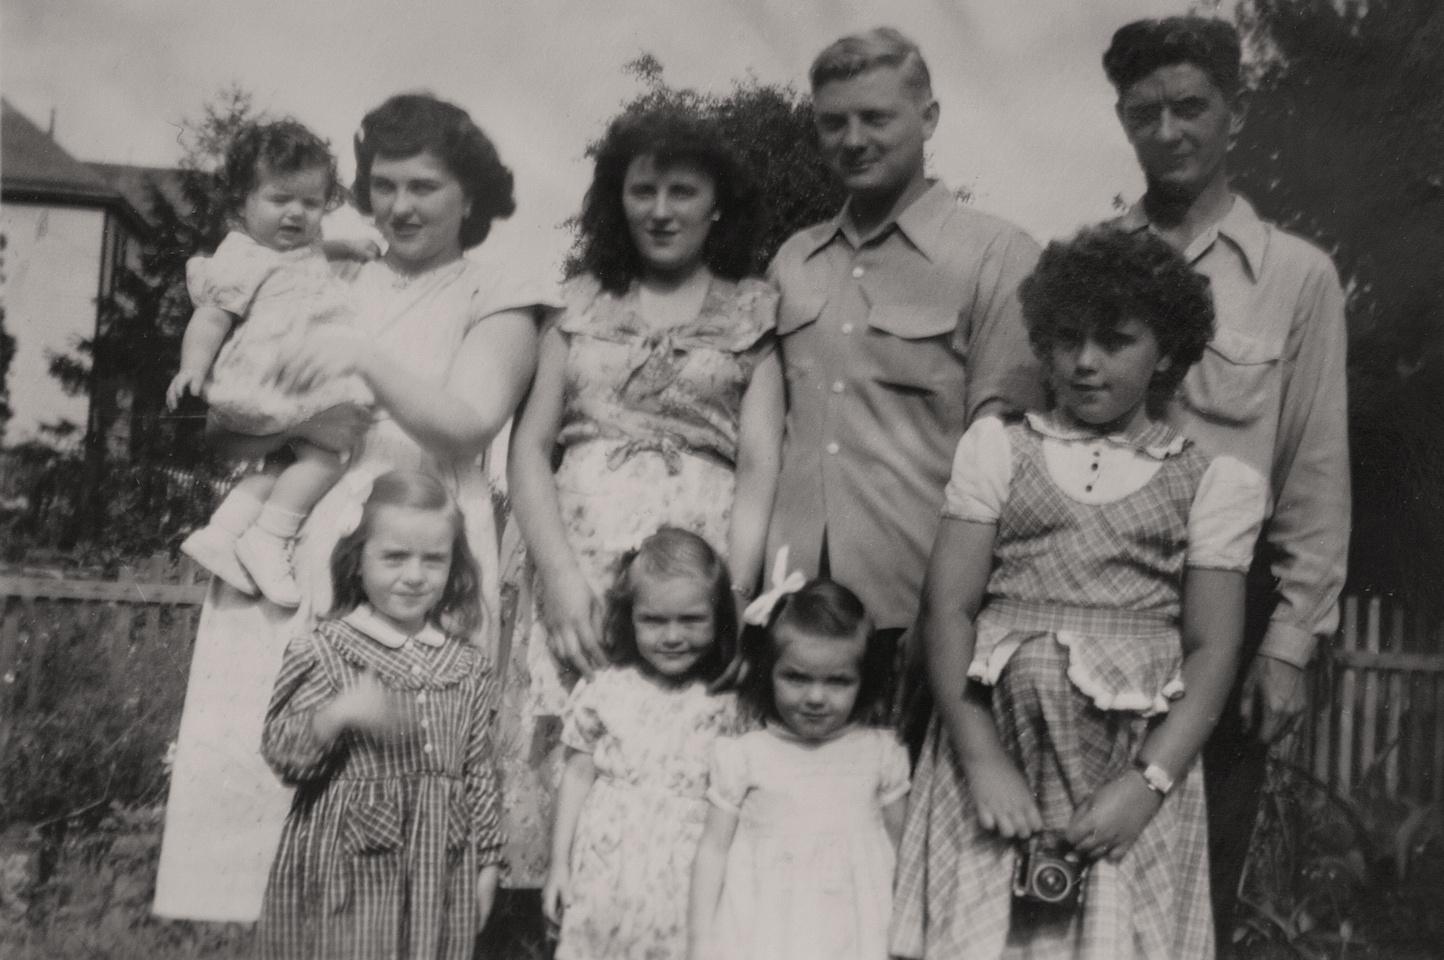 Michelle M. Murosky: The Murosky Collection &emdash; 1948 - Murosky Family Photo